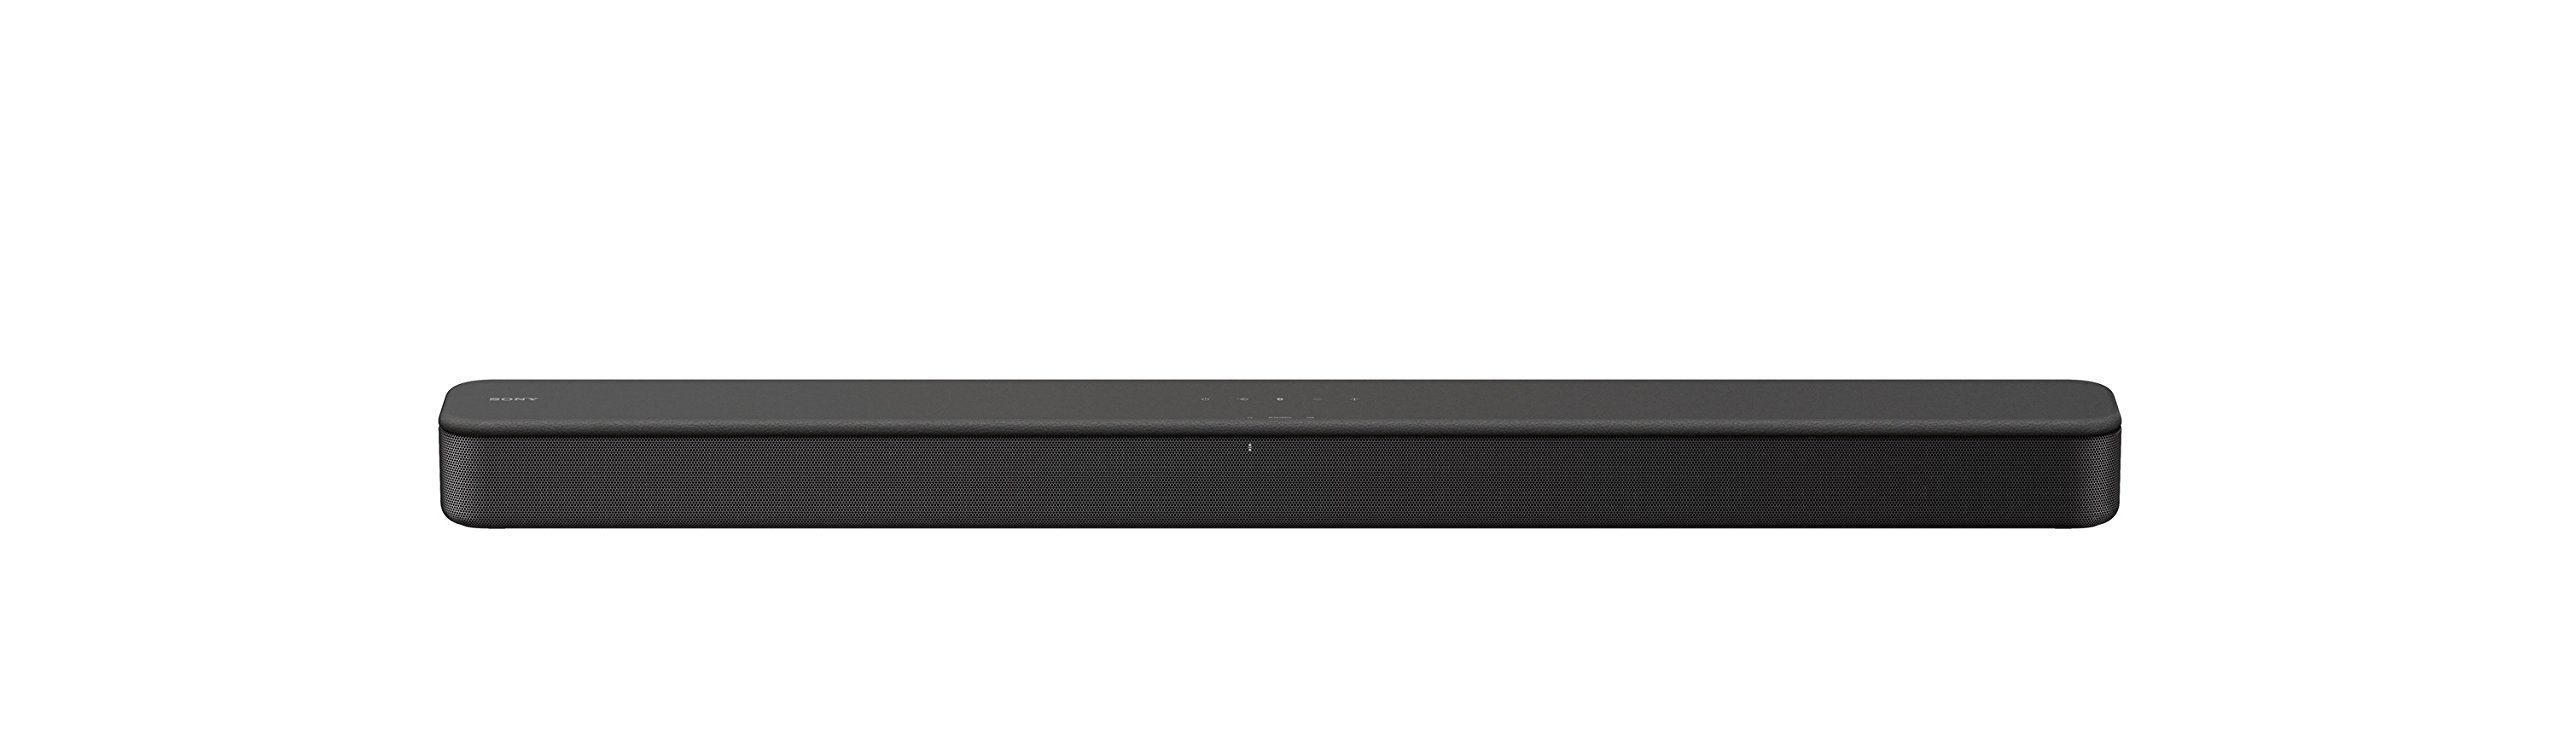 Sony S100F 2.0ch Soundbar with integrated tweeter (HT-S100F)